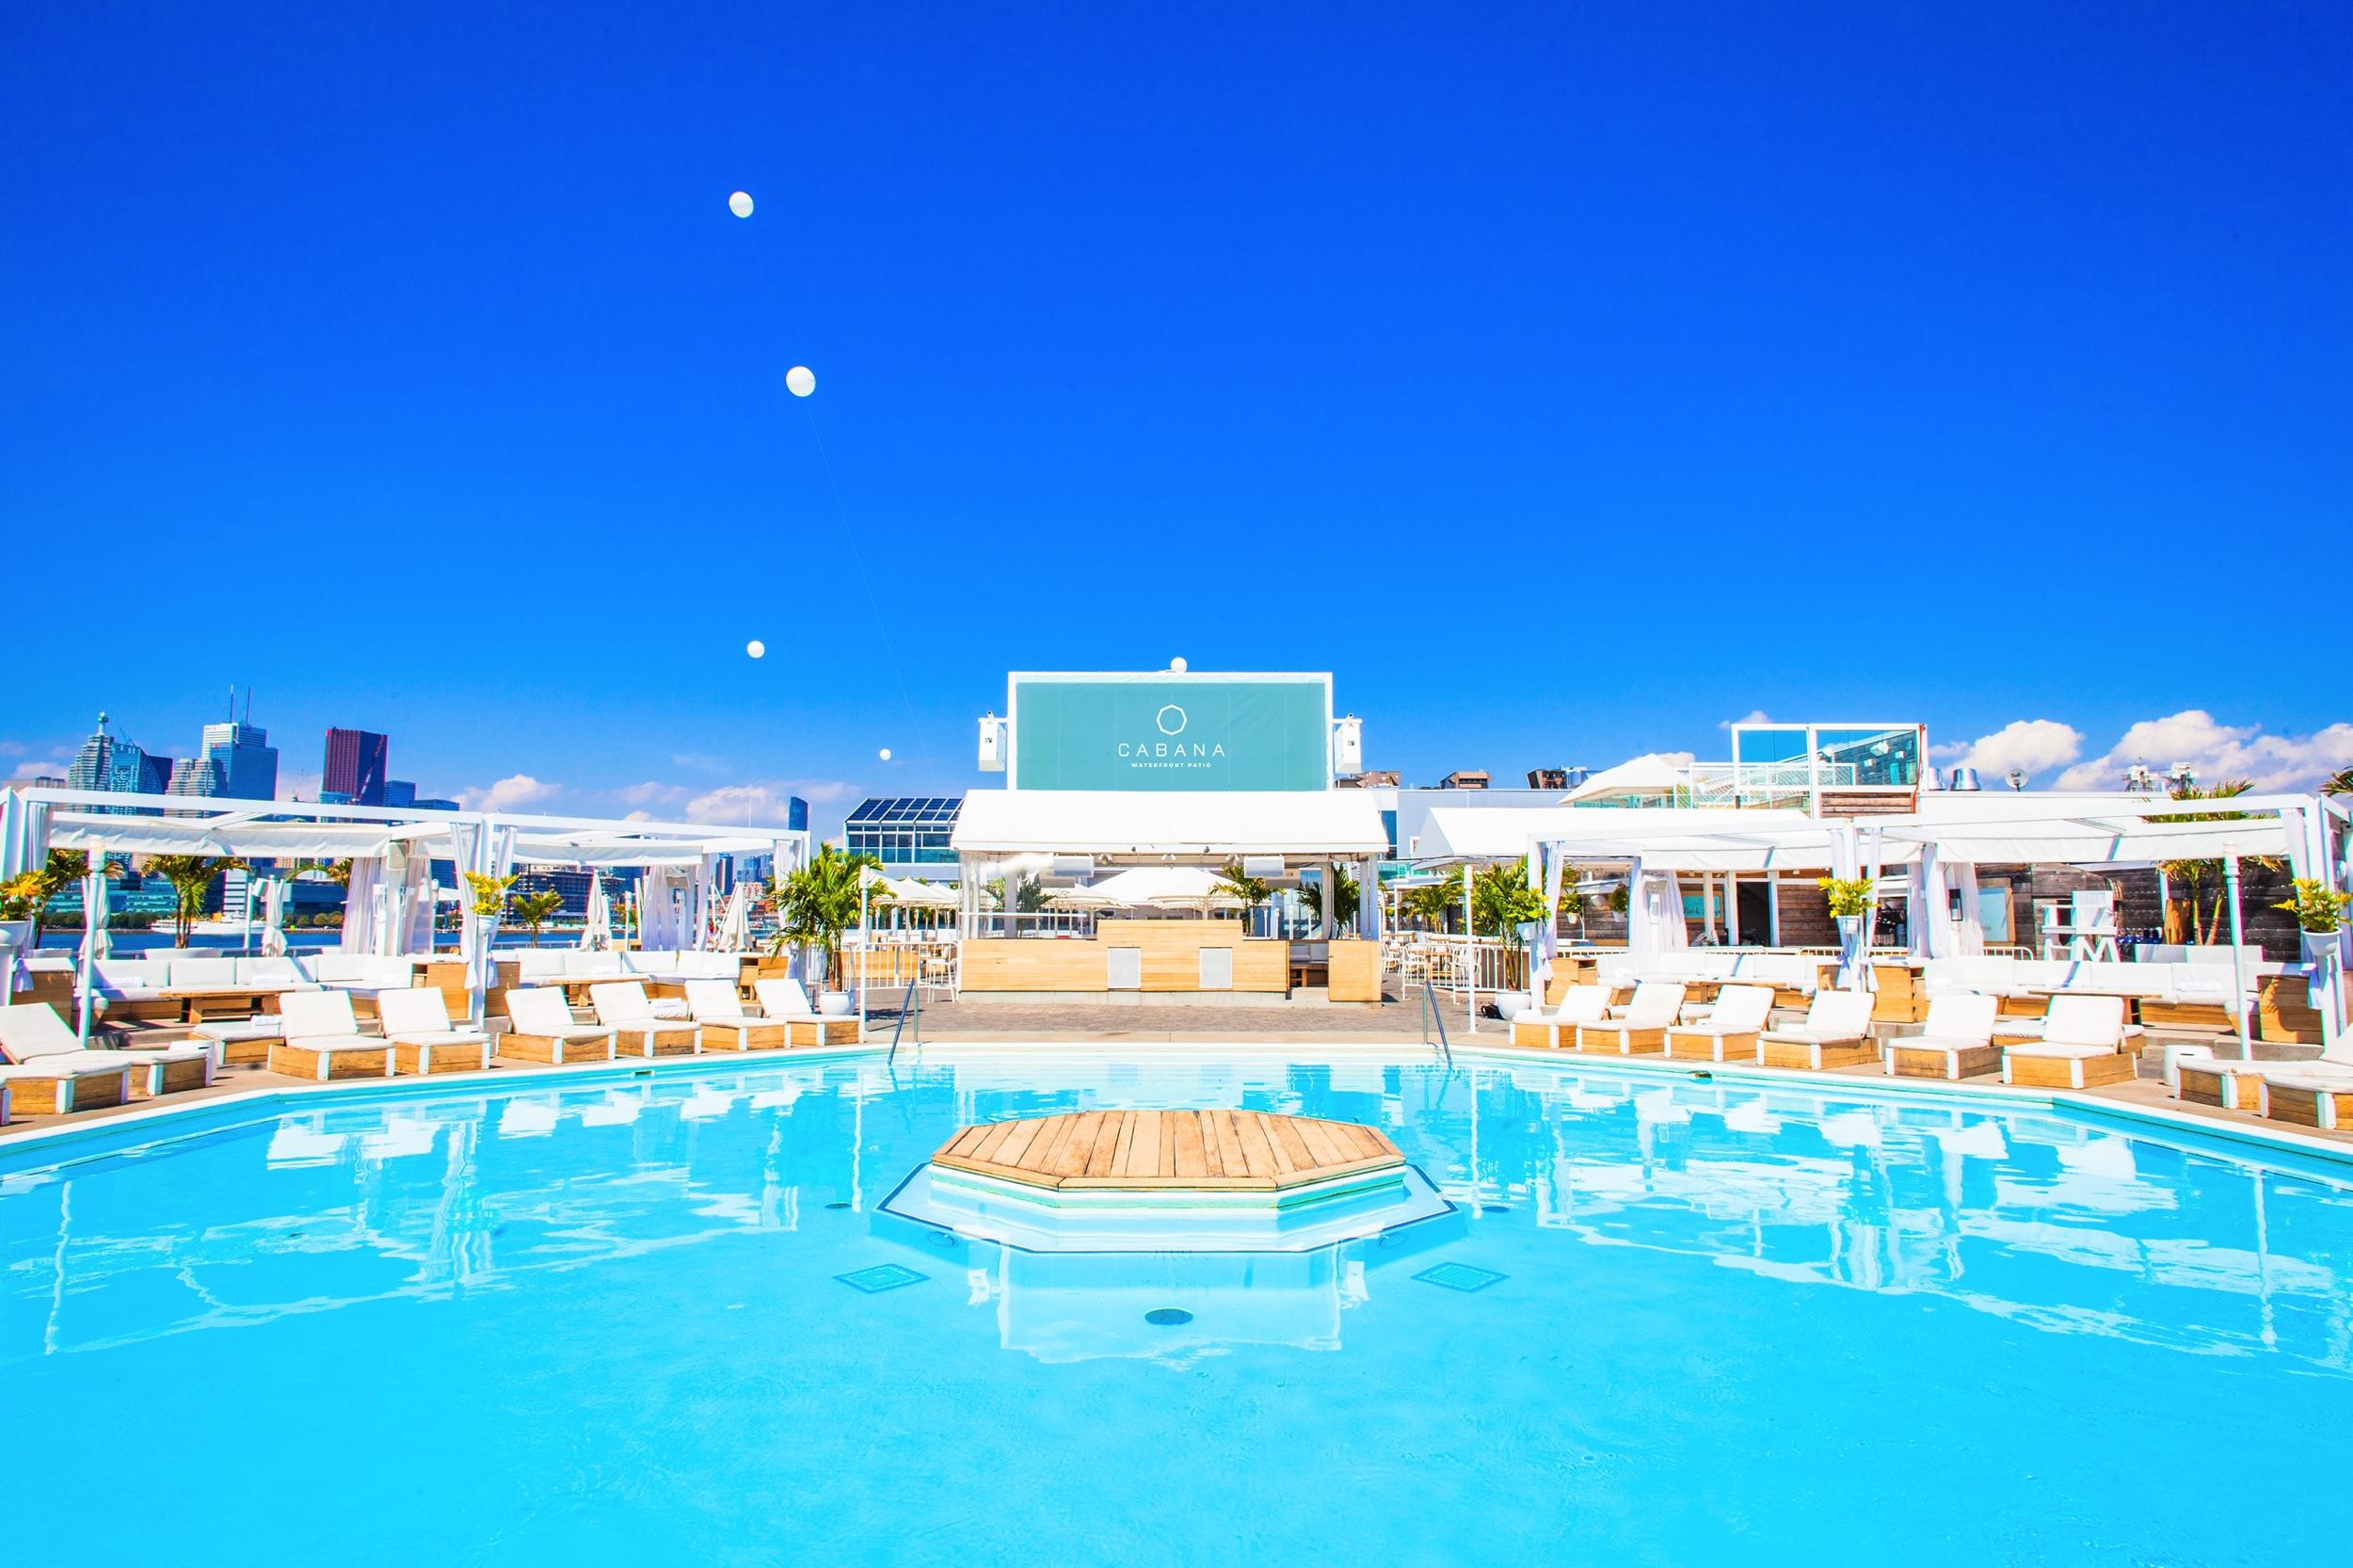 Cabana-Pool_i